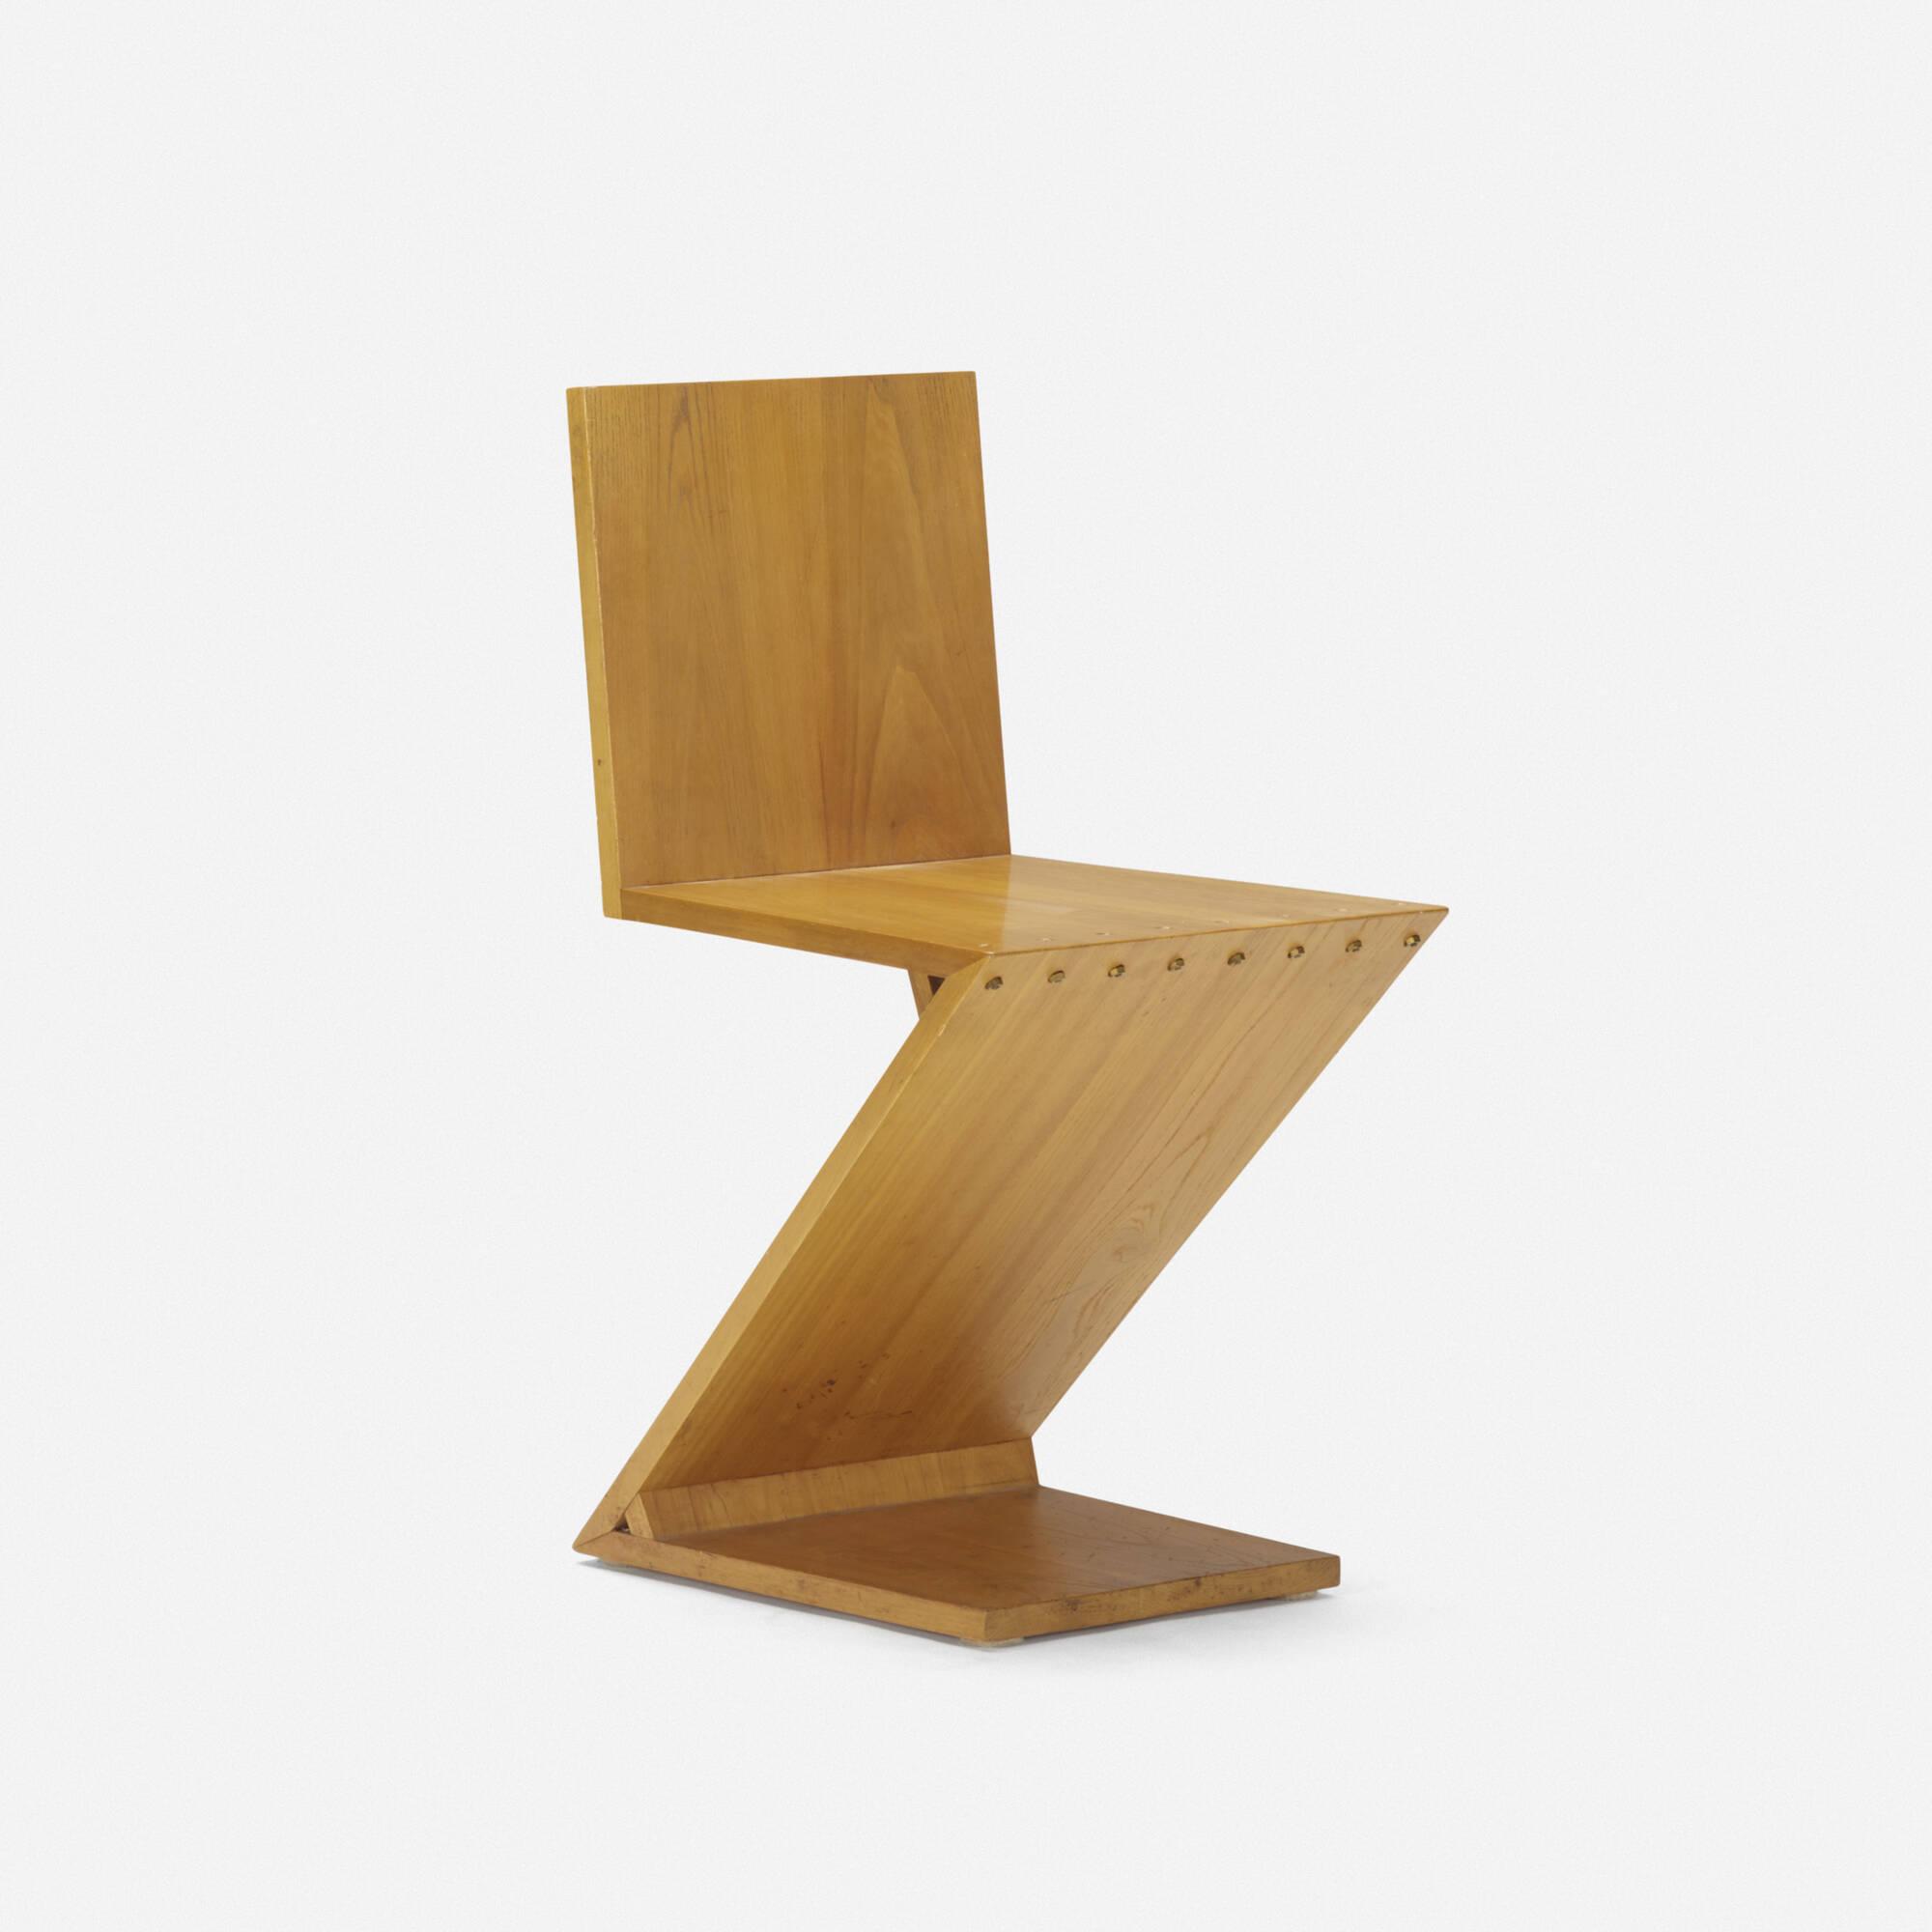 110 gerrit rietveld zig zag chair for Design stuhl zig zag